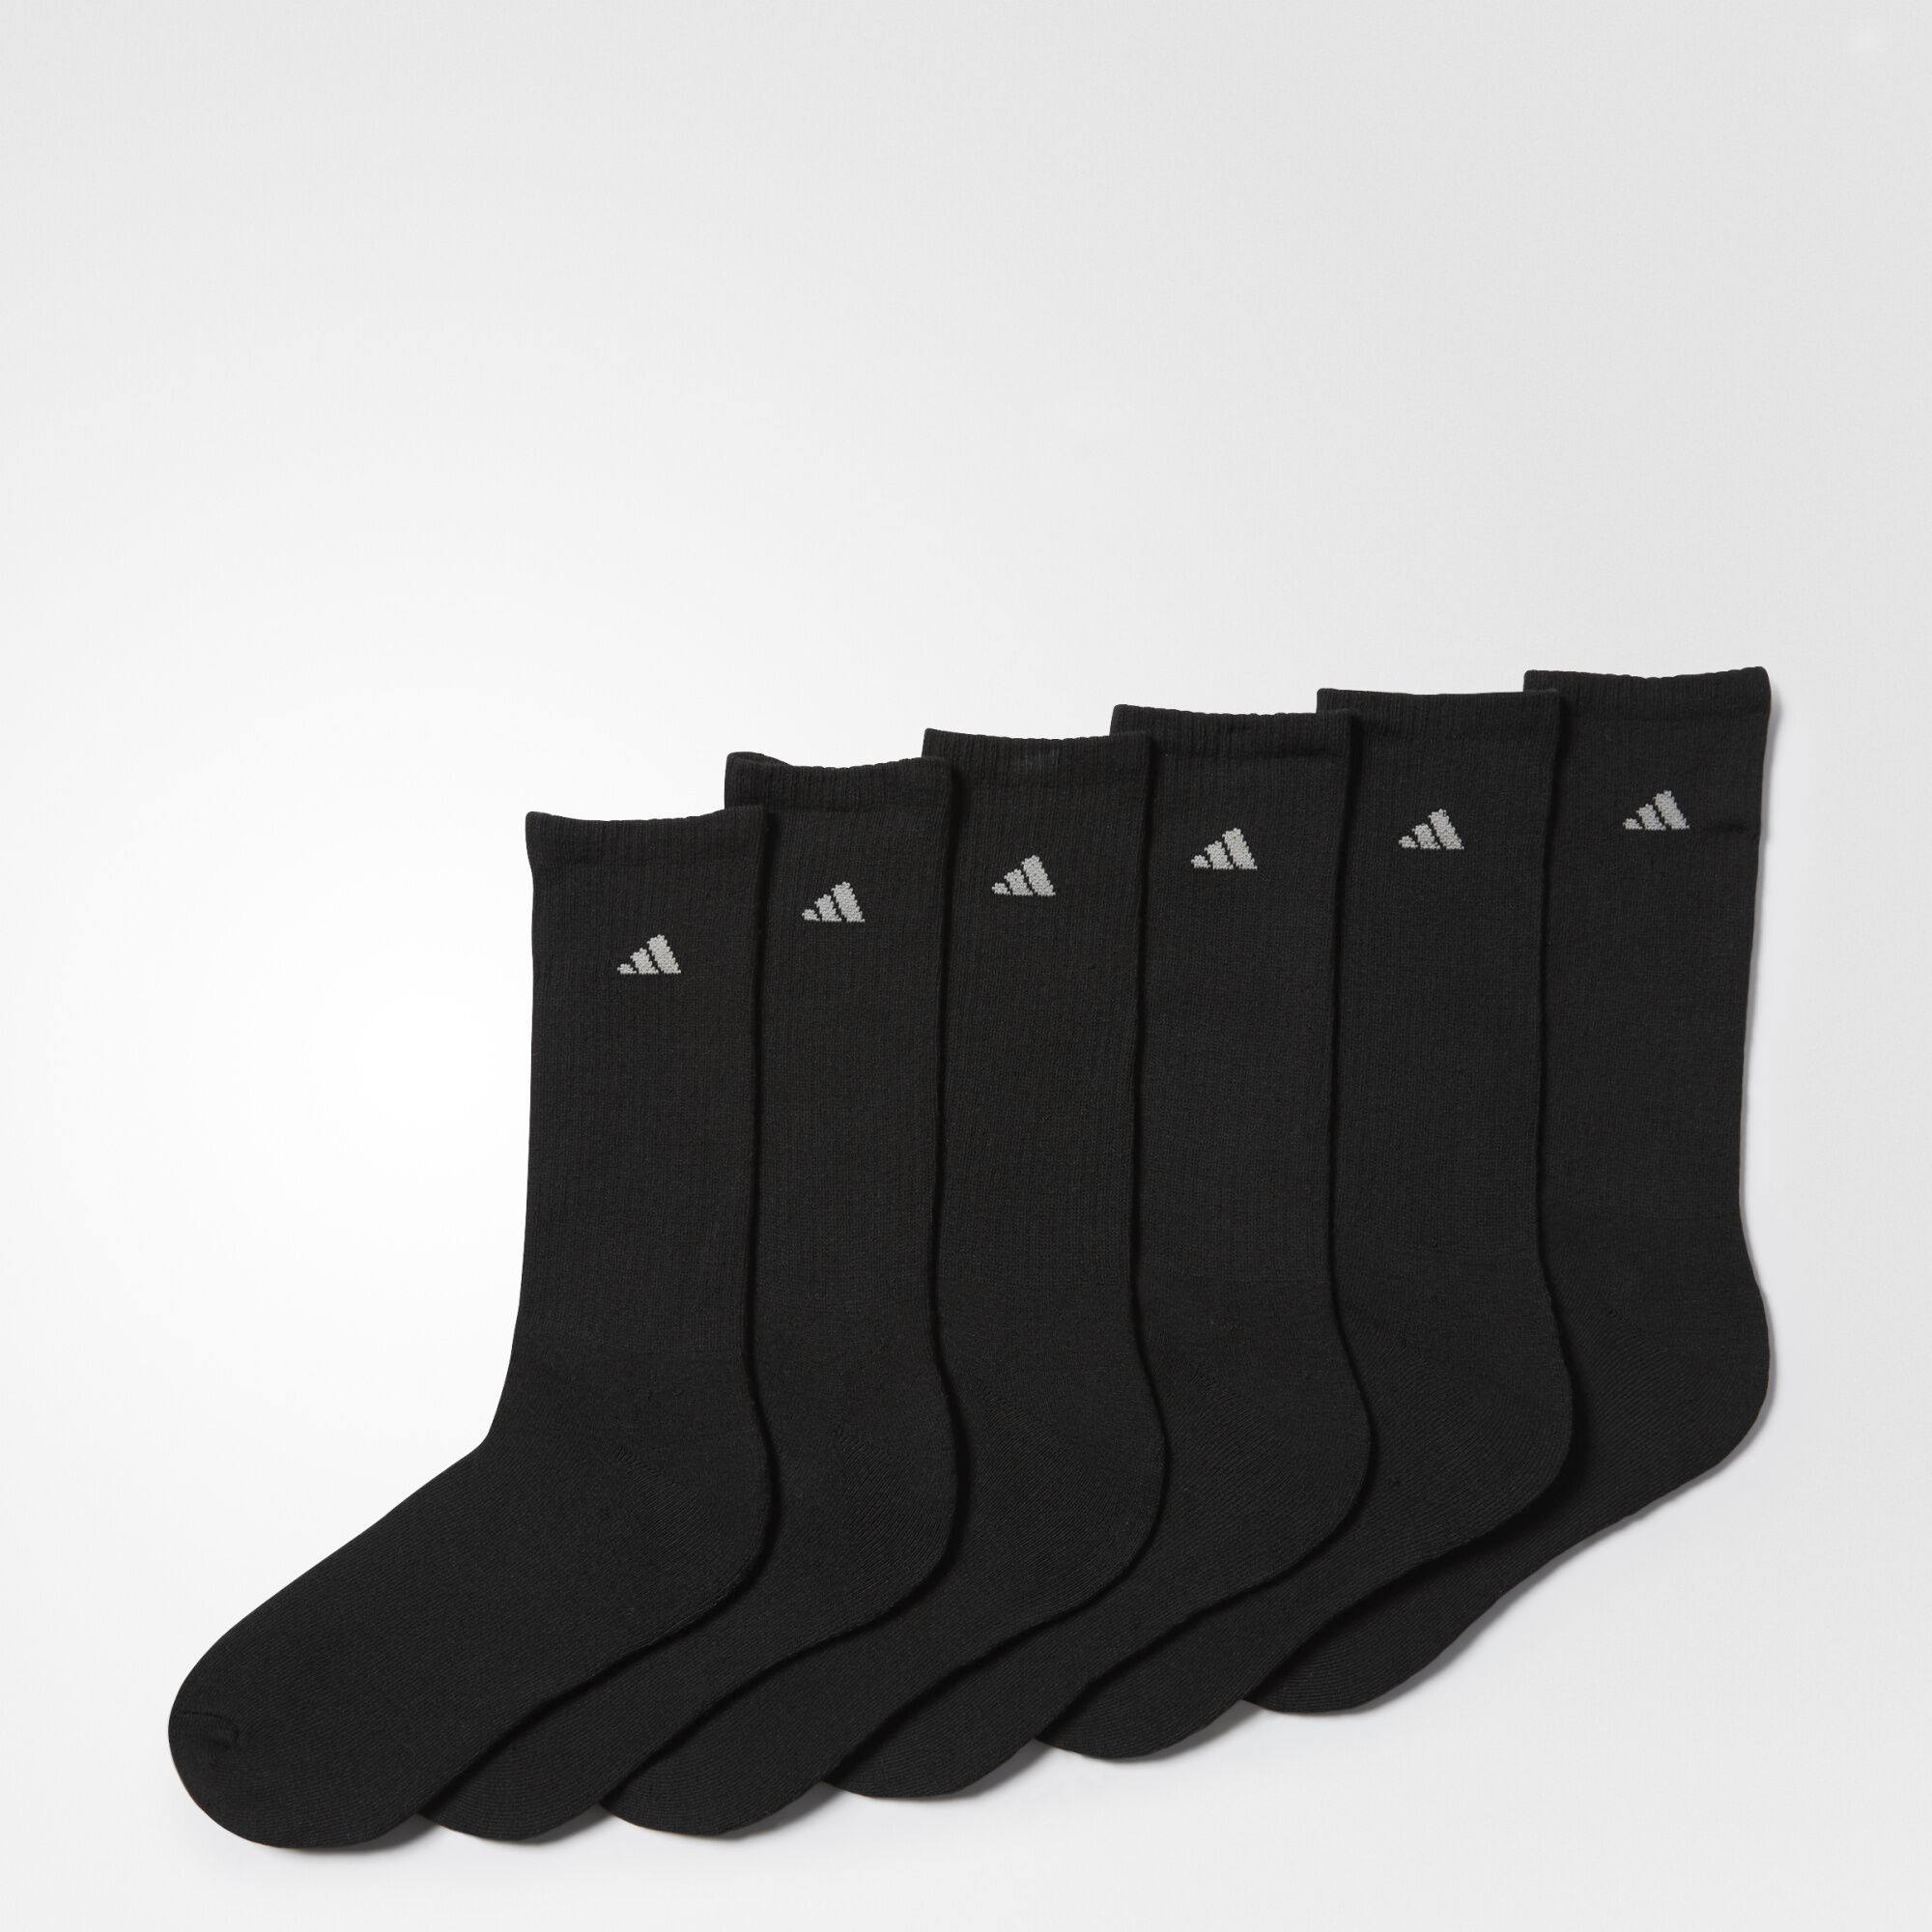 James Harden Date Of Birth: Adidas Athletic Crew Socks 6 Pairs - Black